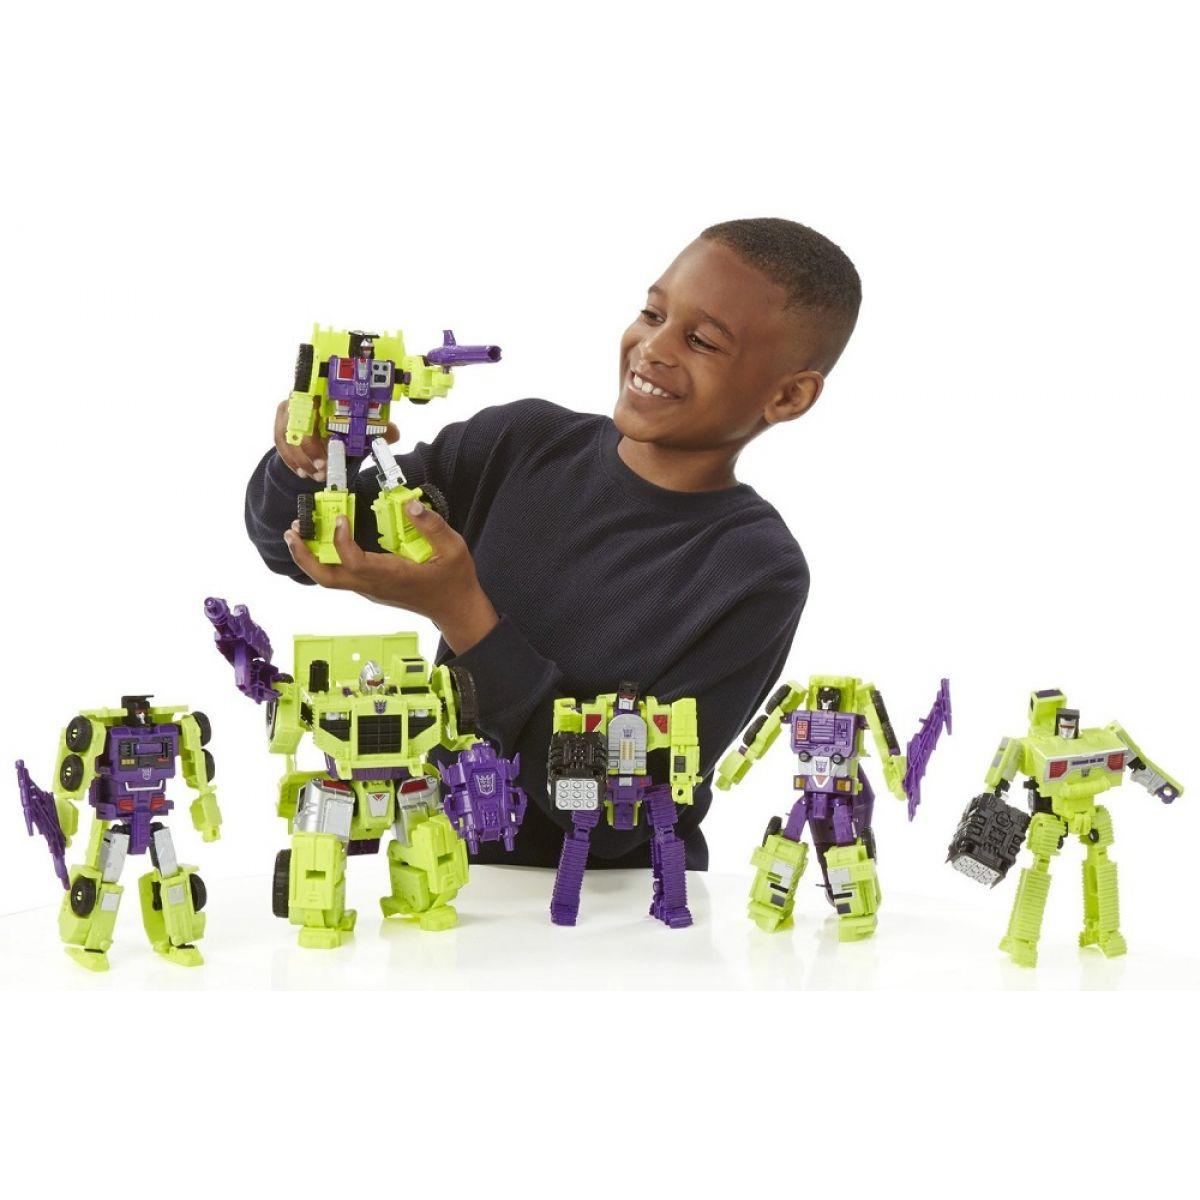 Transformers Generations Devastator 45 cm #6